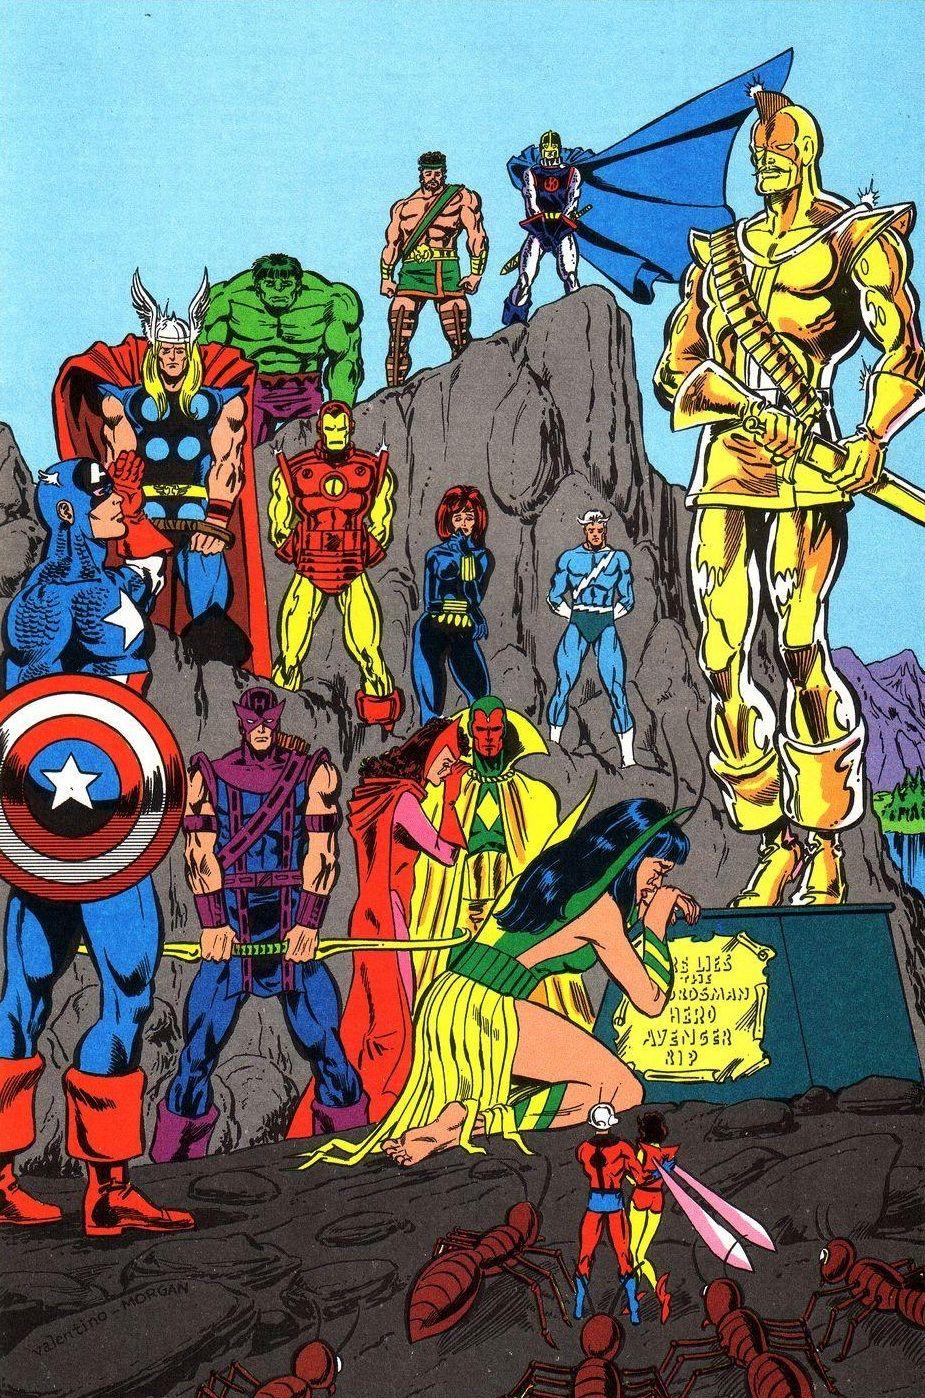 Iron Man Hulk Captain America Thor Hawkeye Black Widow